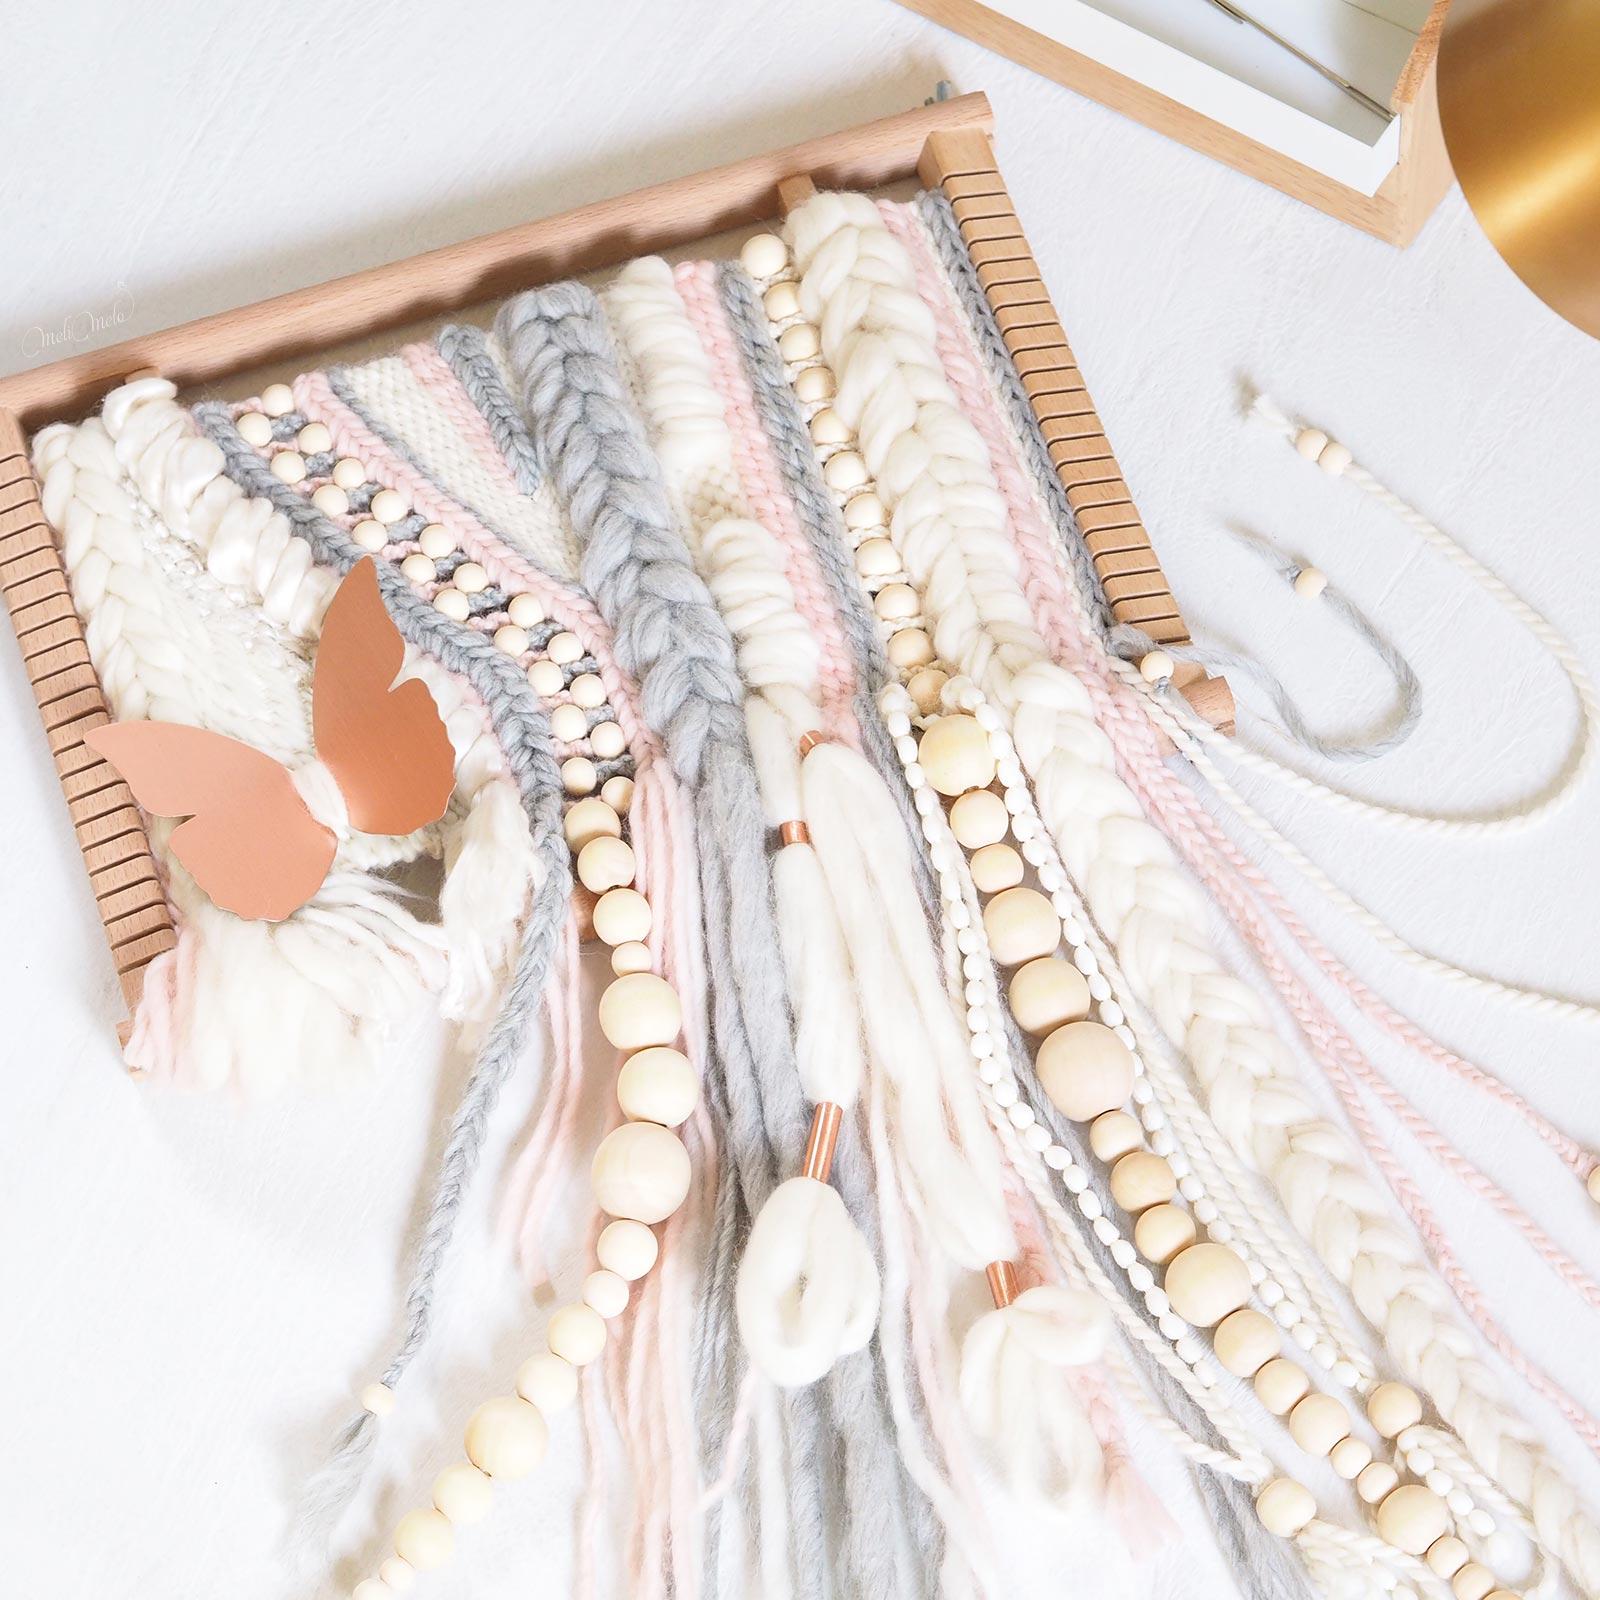 tissage perles en bois laine plassard woolandthegang handweaving on the loom laboutiquedemelimelo